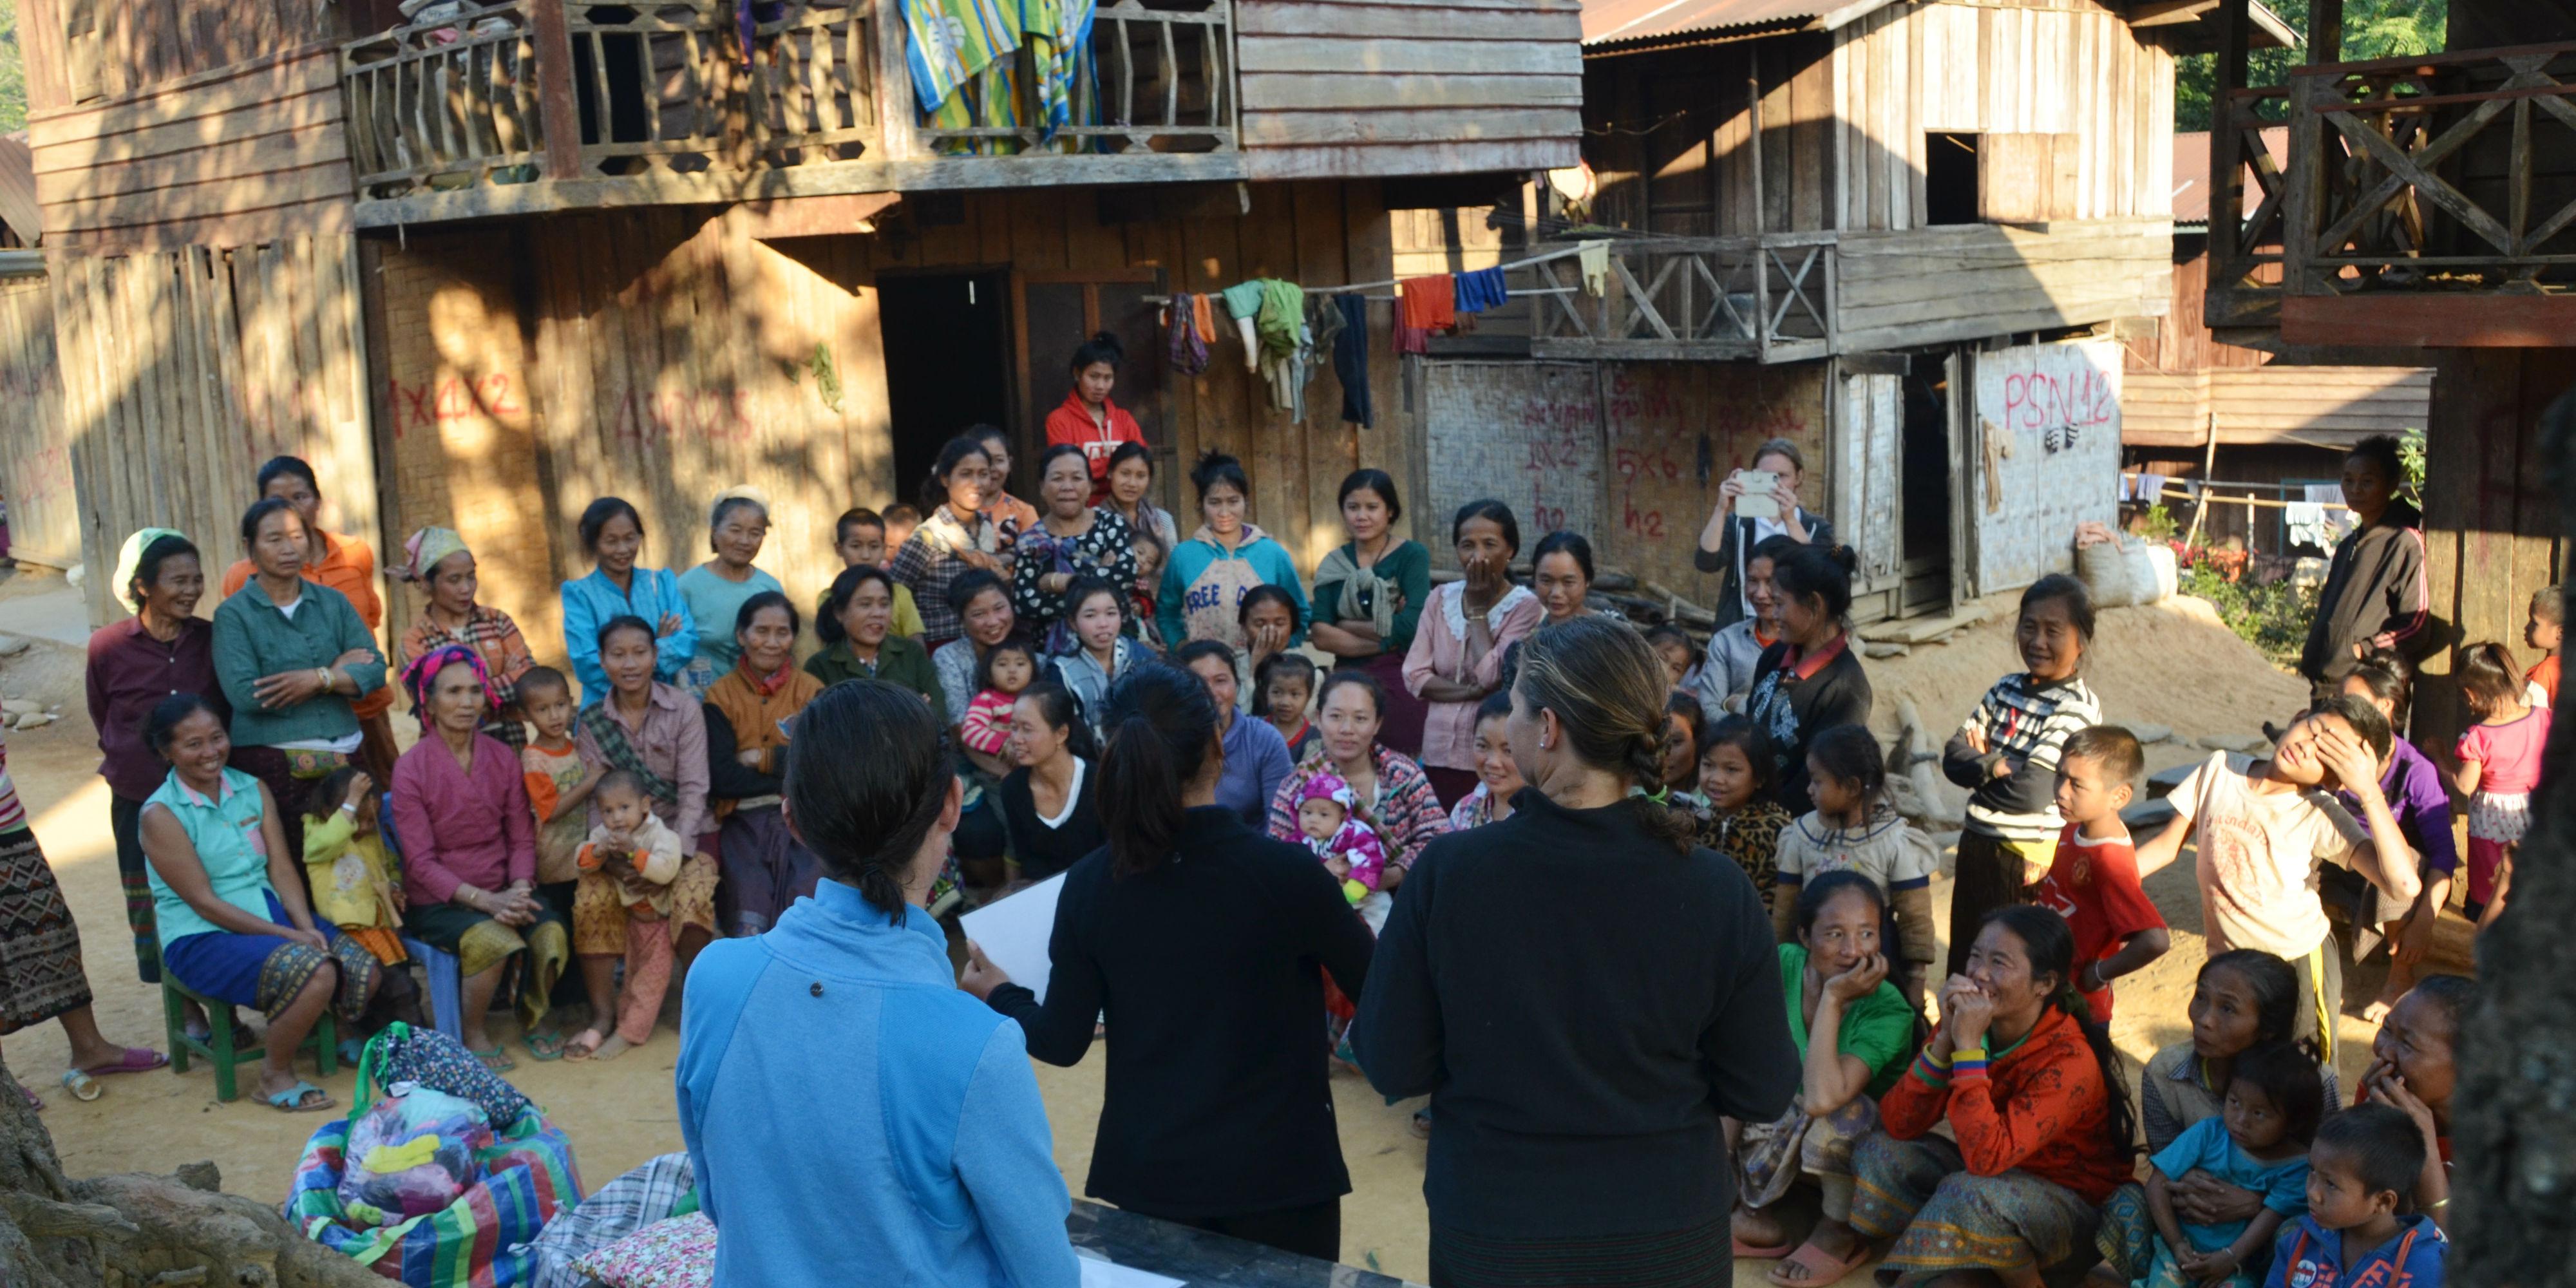 GVI participants help Laos women learn about menstration through a women's empowerment project.